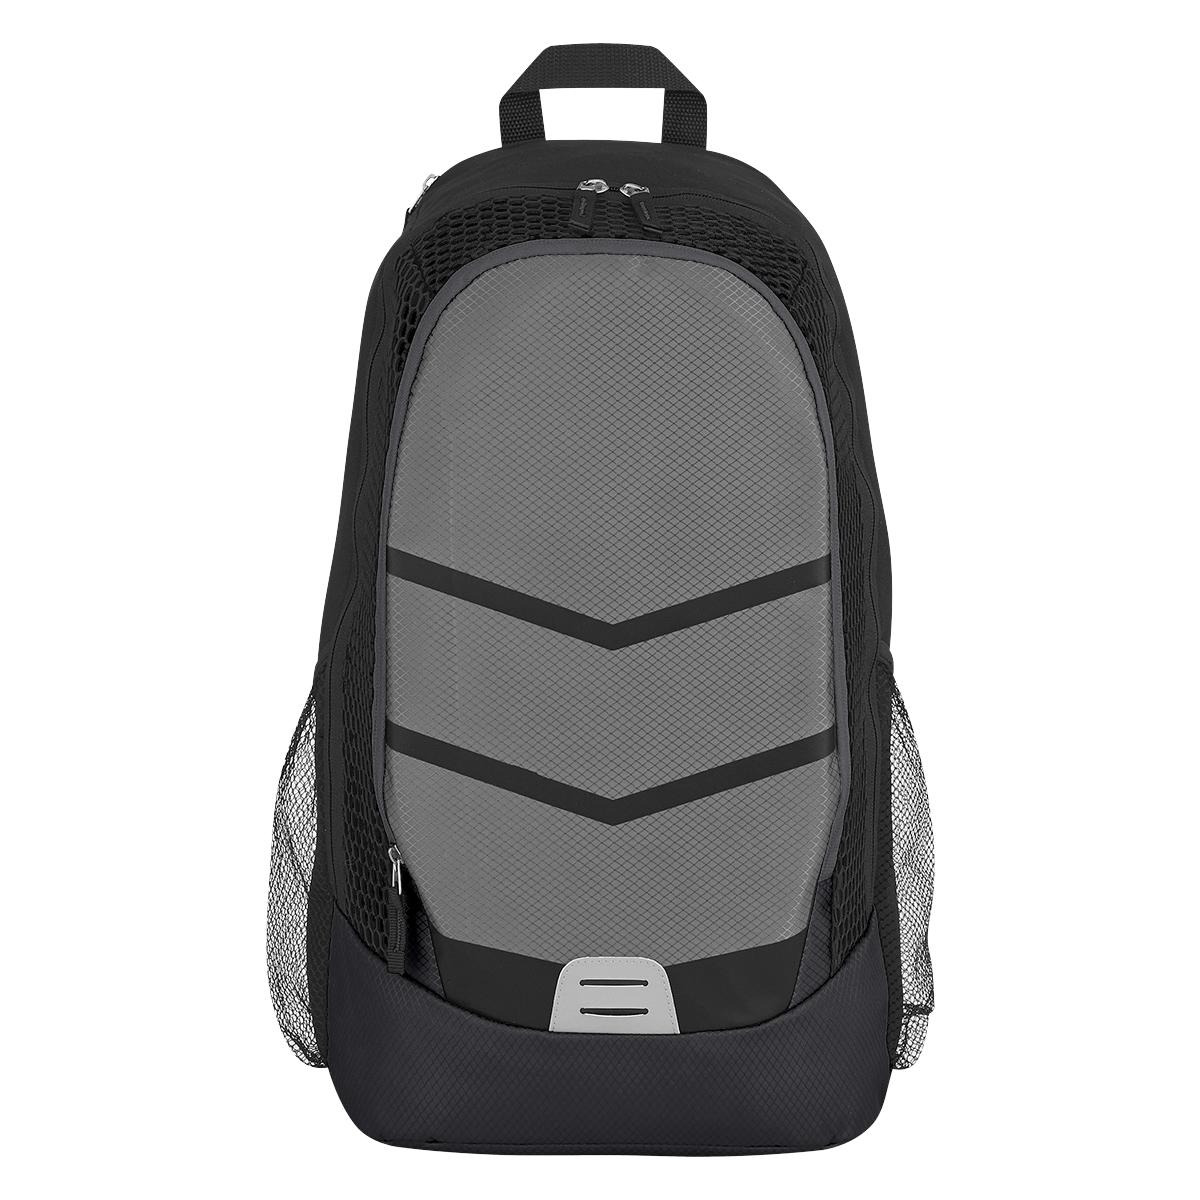 3410 - Back pack